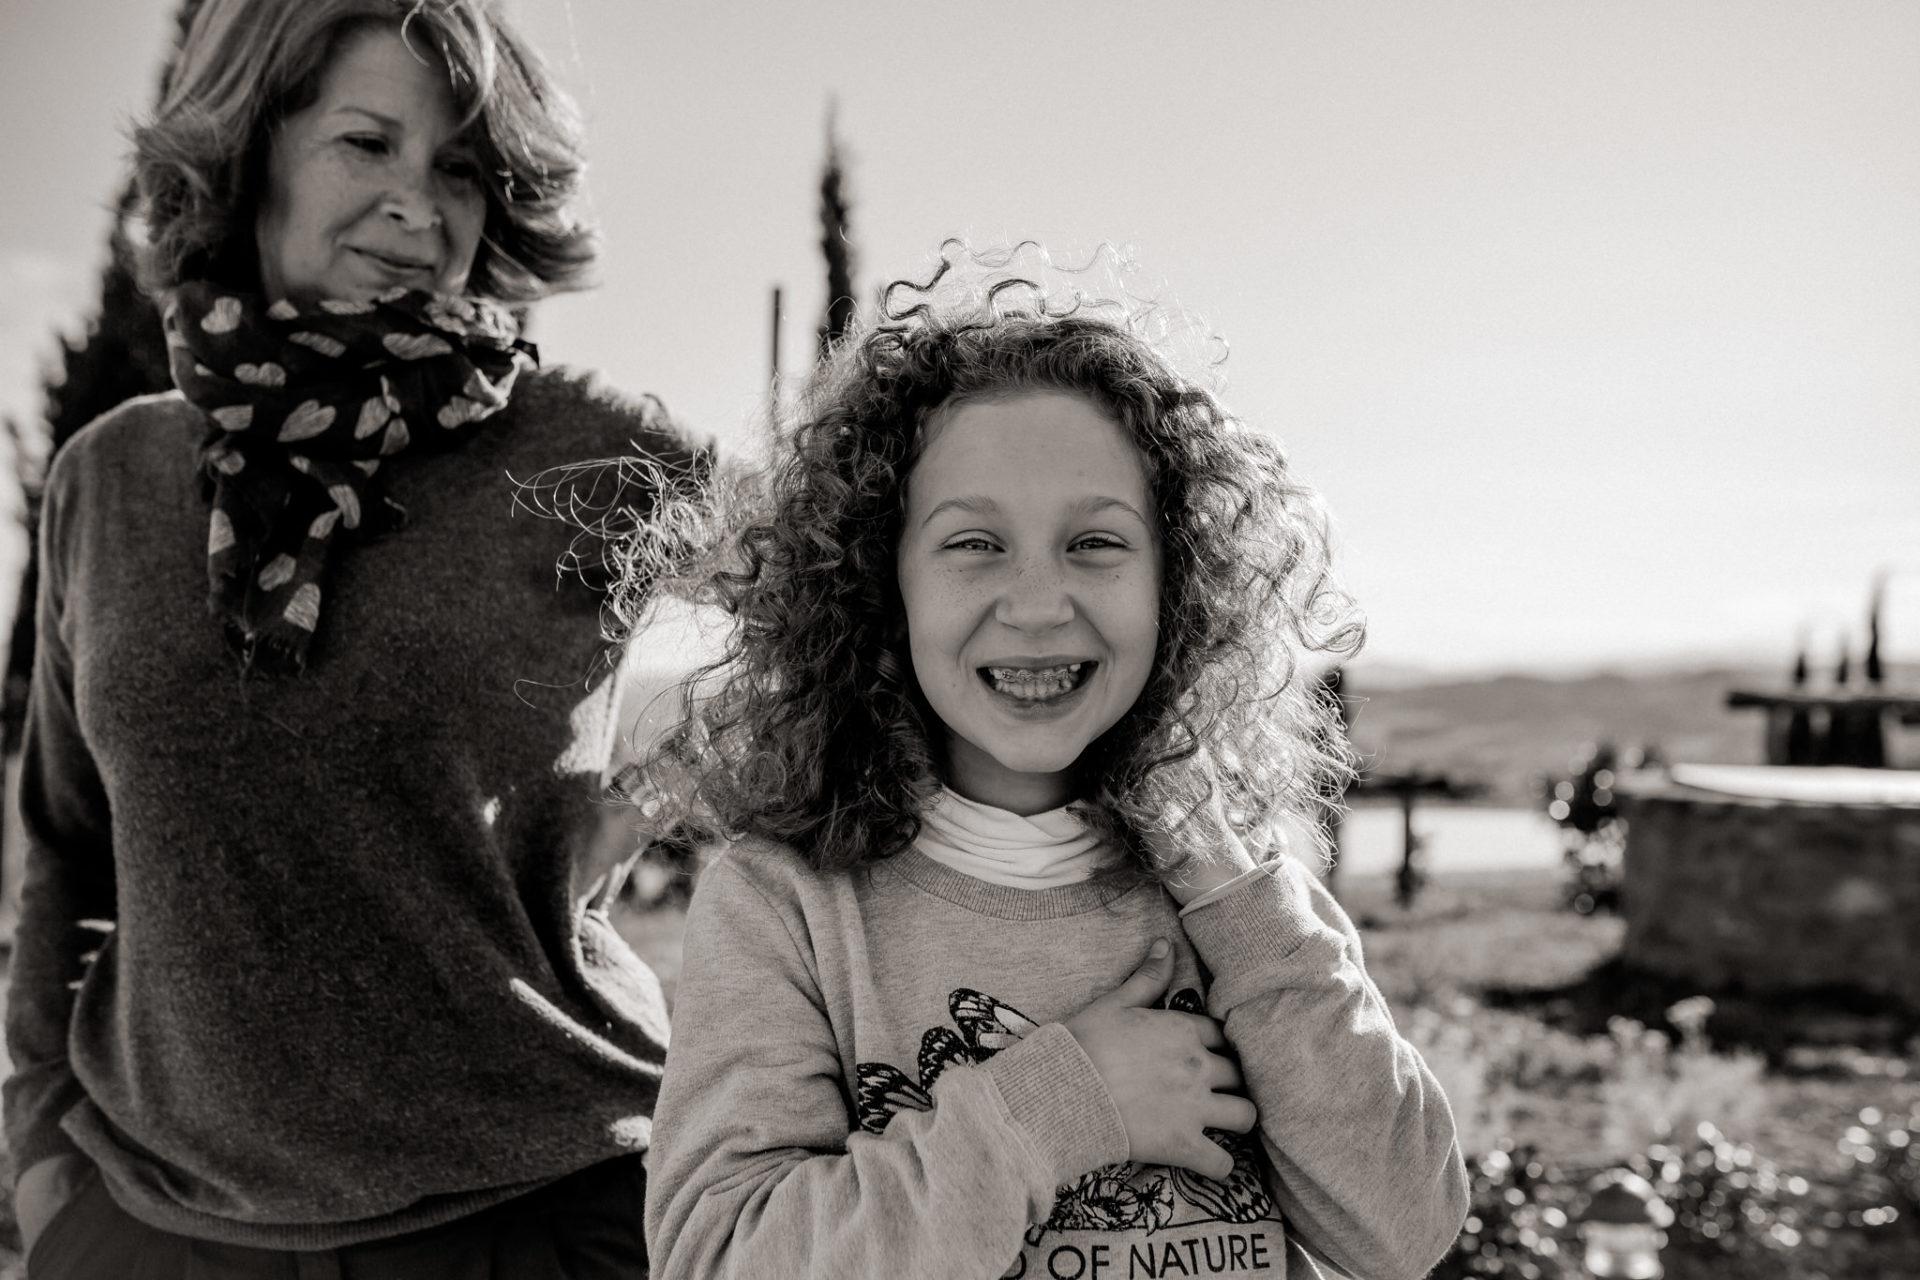 family photos holiday tuscany-dimora santa margherita-intimate portrait-family photographer stuttgart-mother daughter love